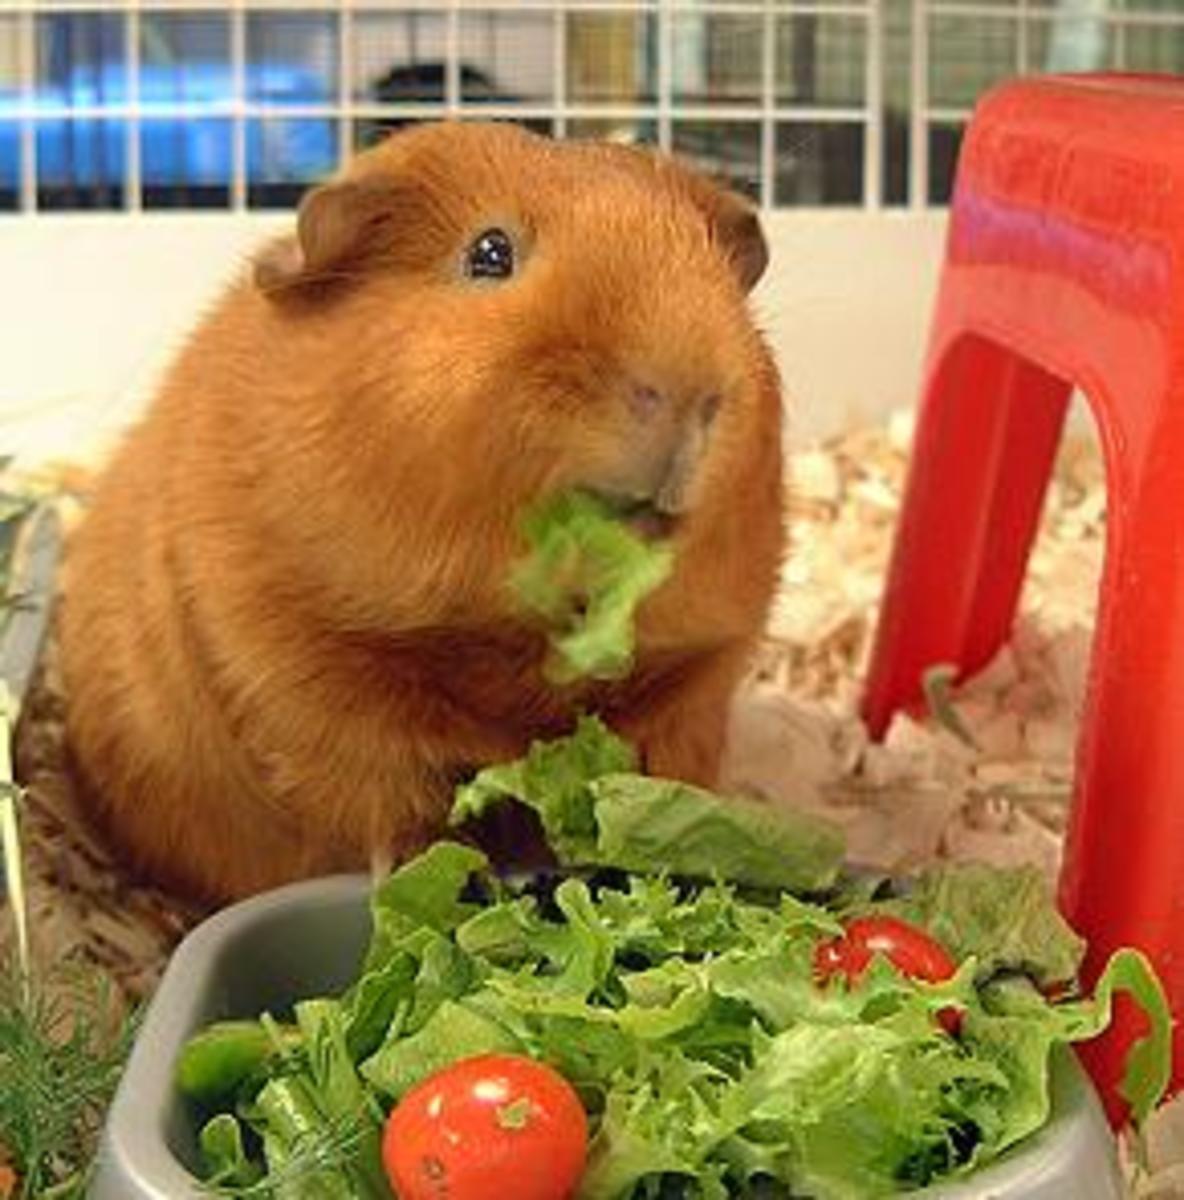 A guinea pig enjoying some fresh vegetables.